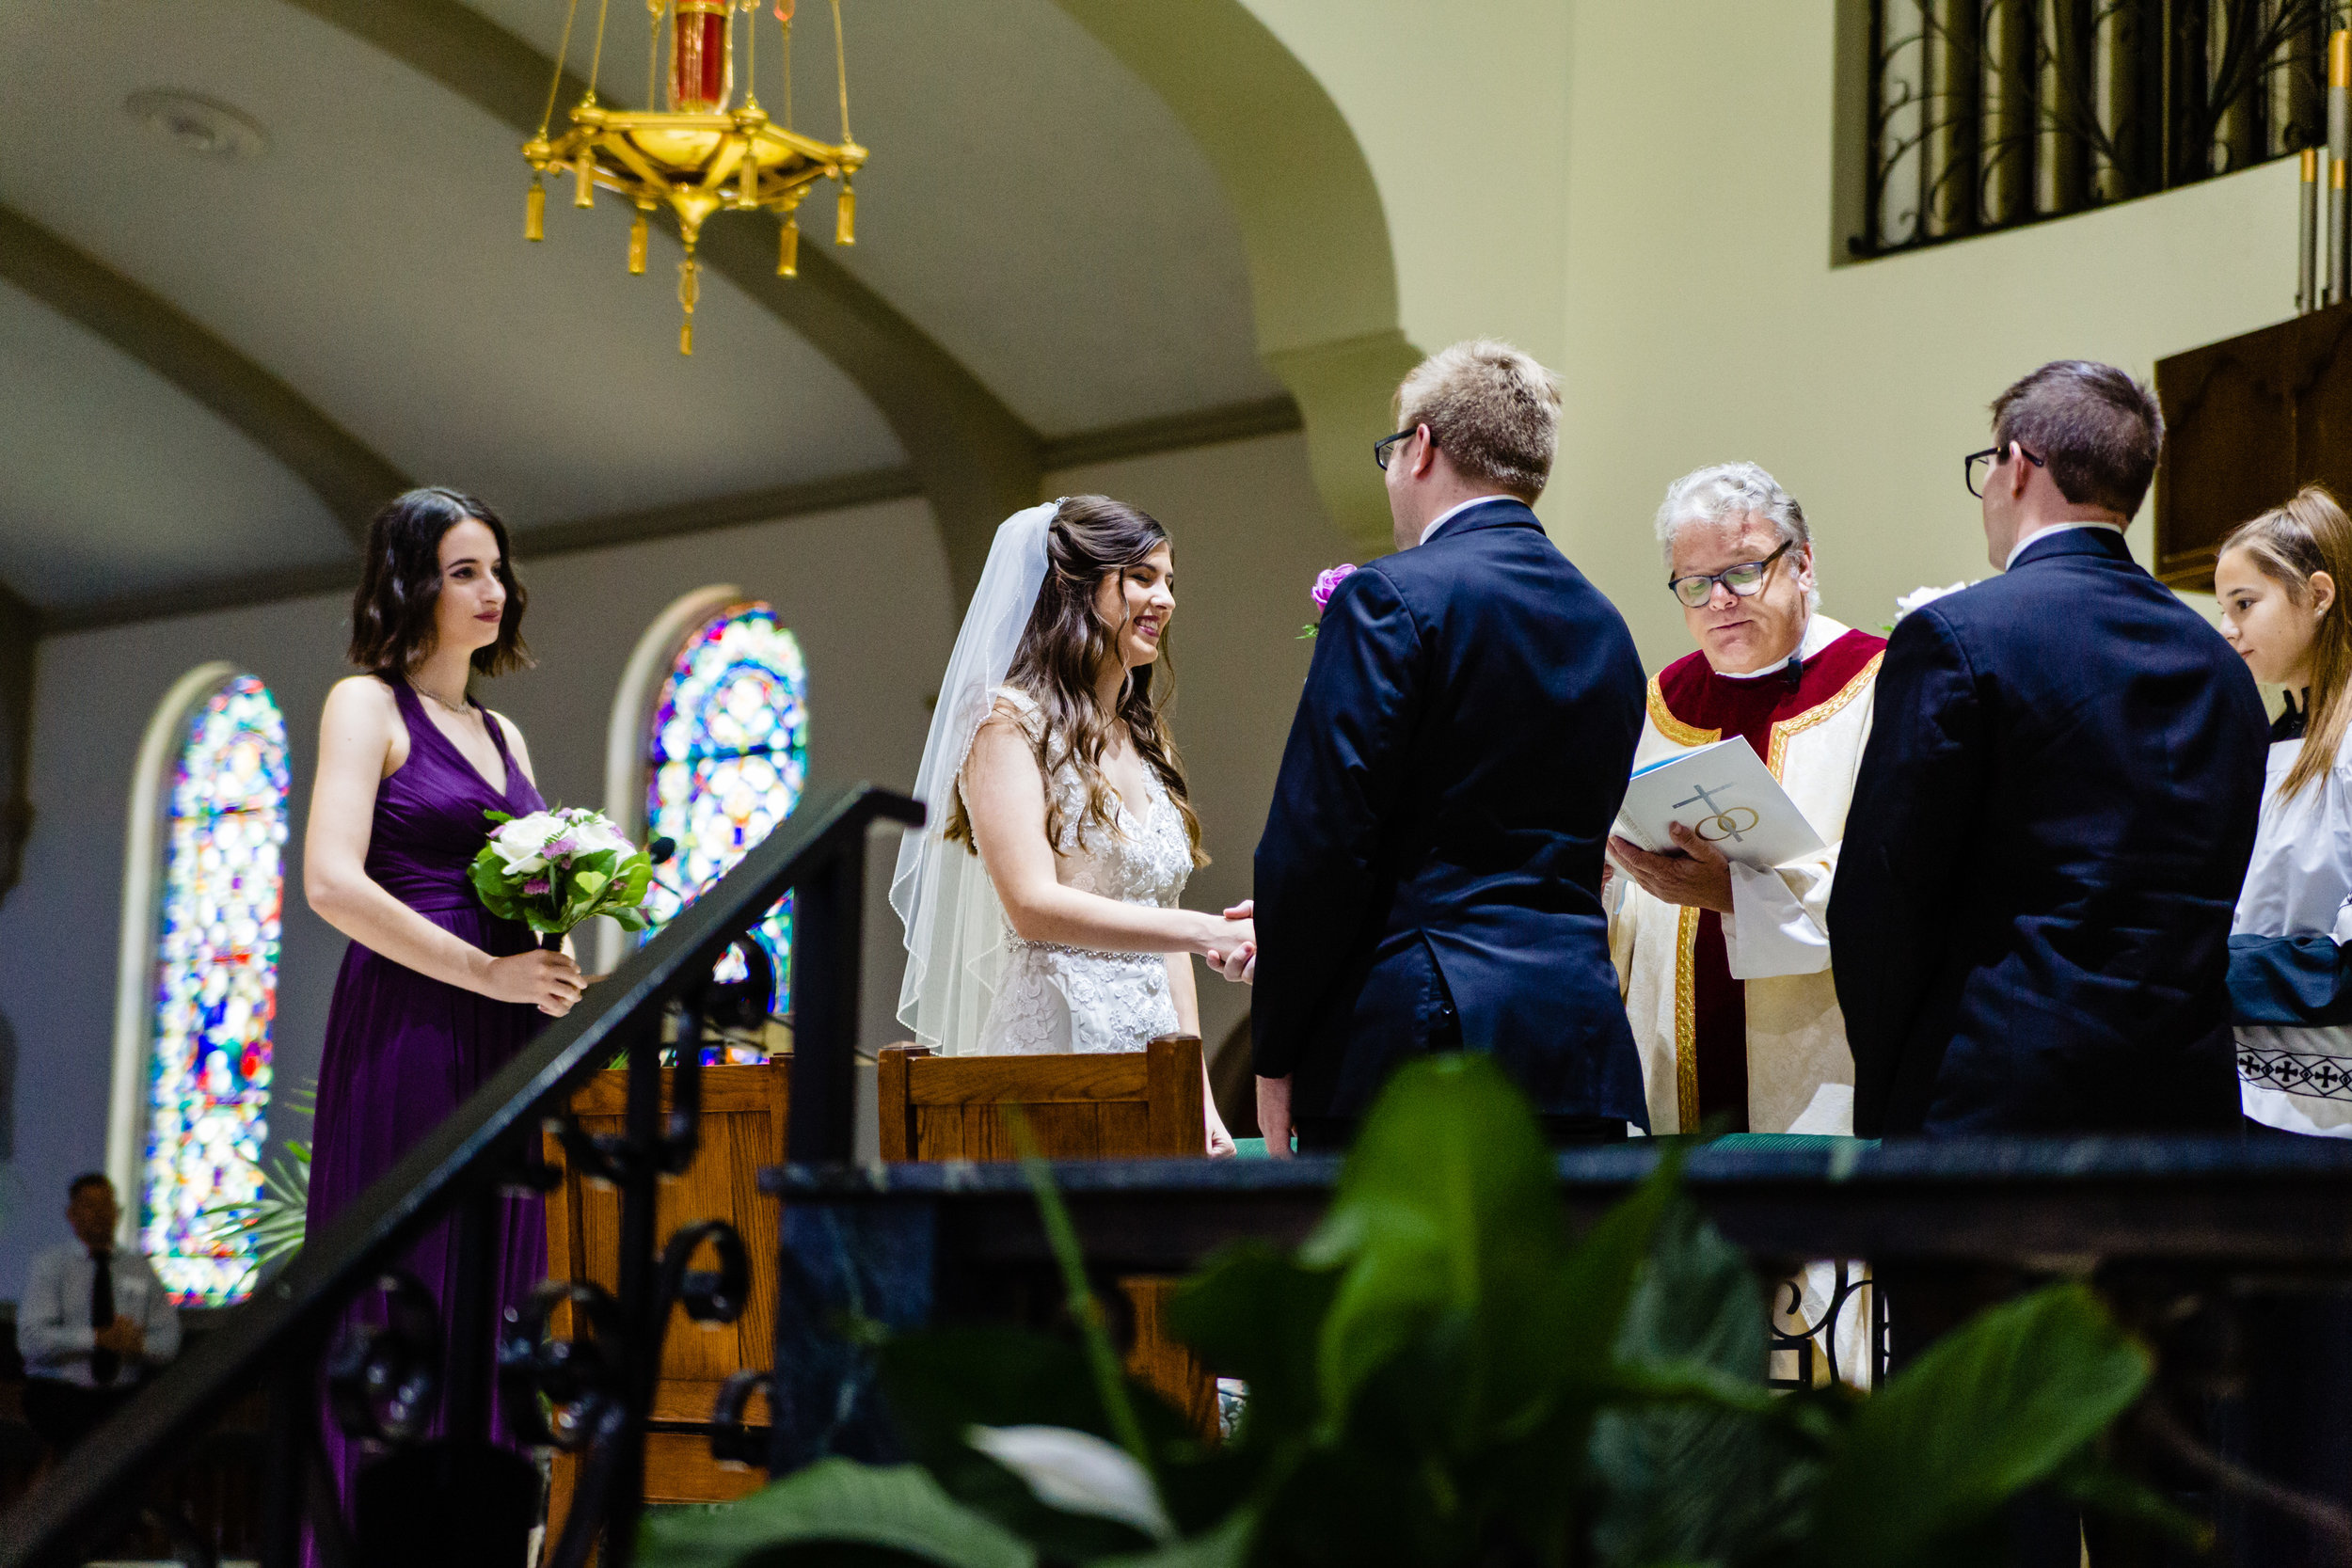 HAH_Zoe and Daniel_Clearwater Wedding_97_2018.jpg